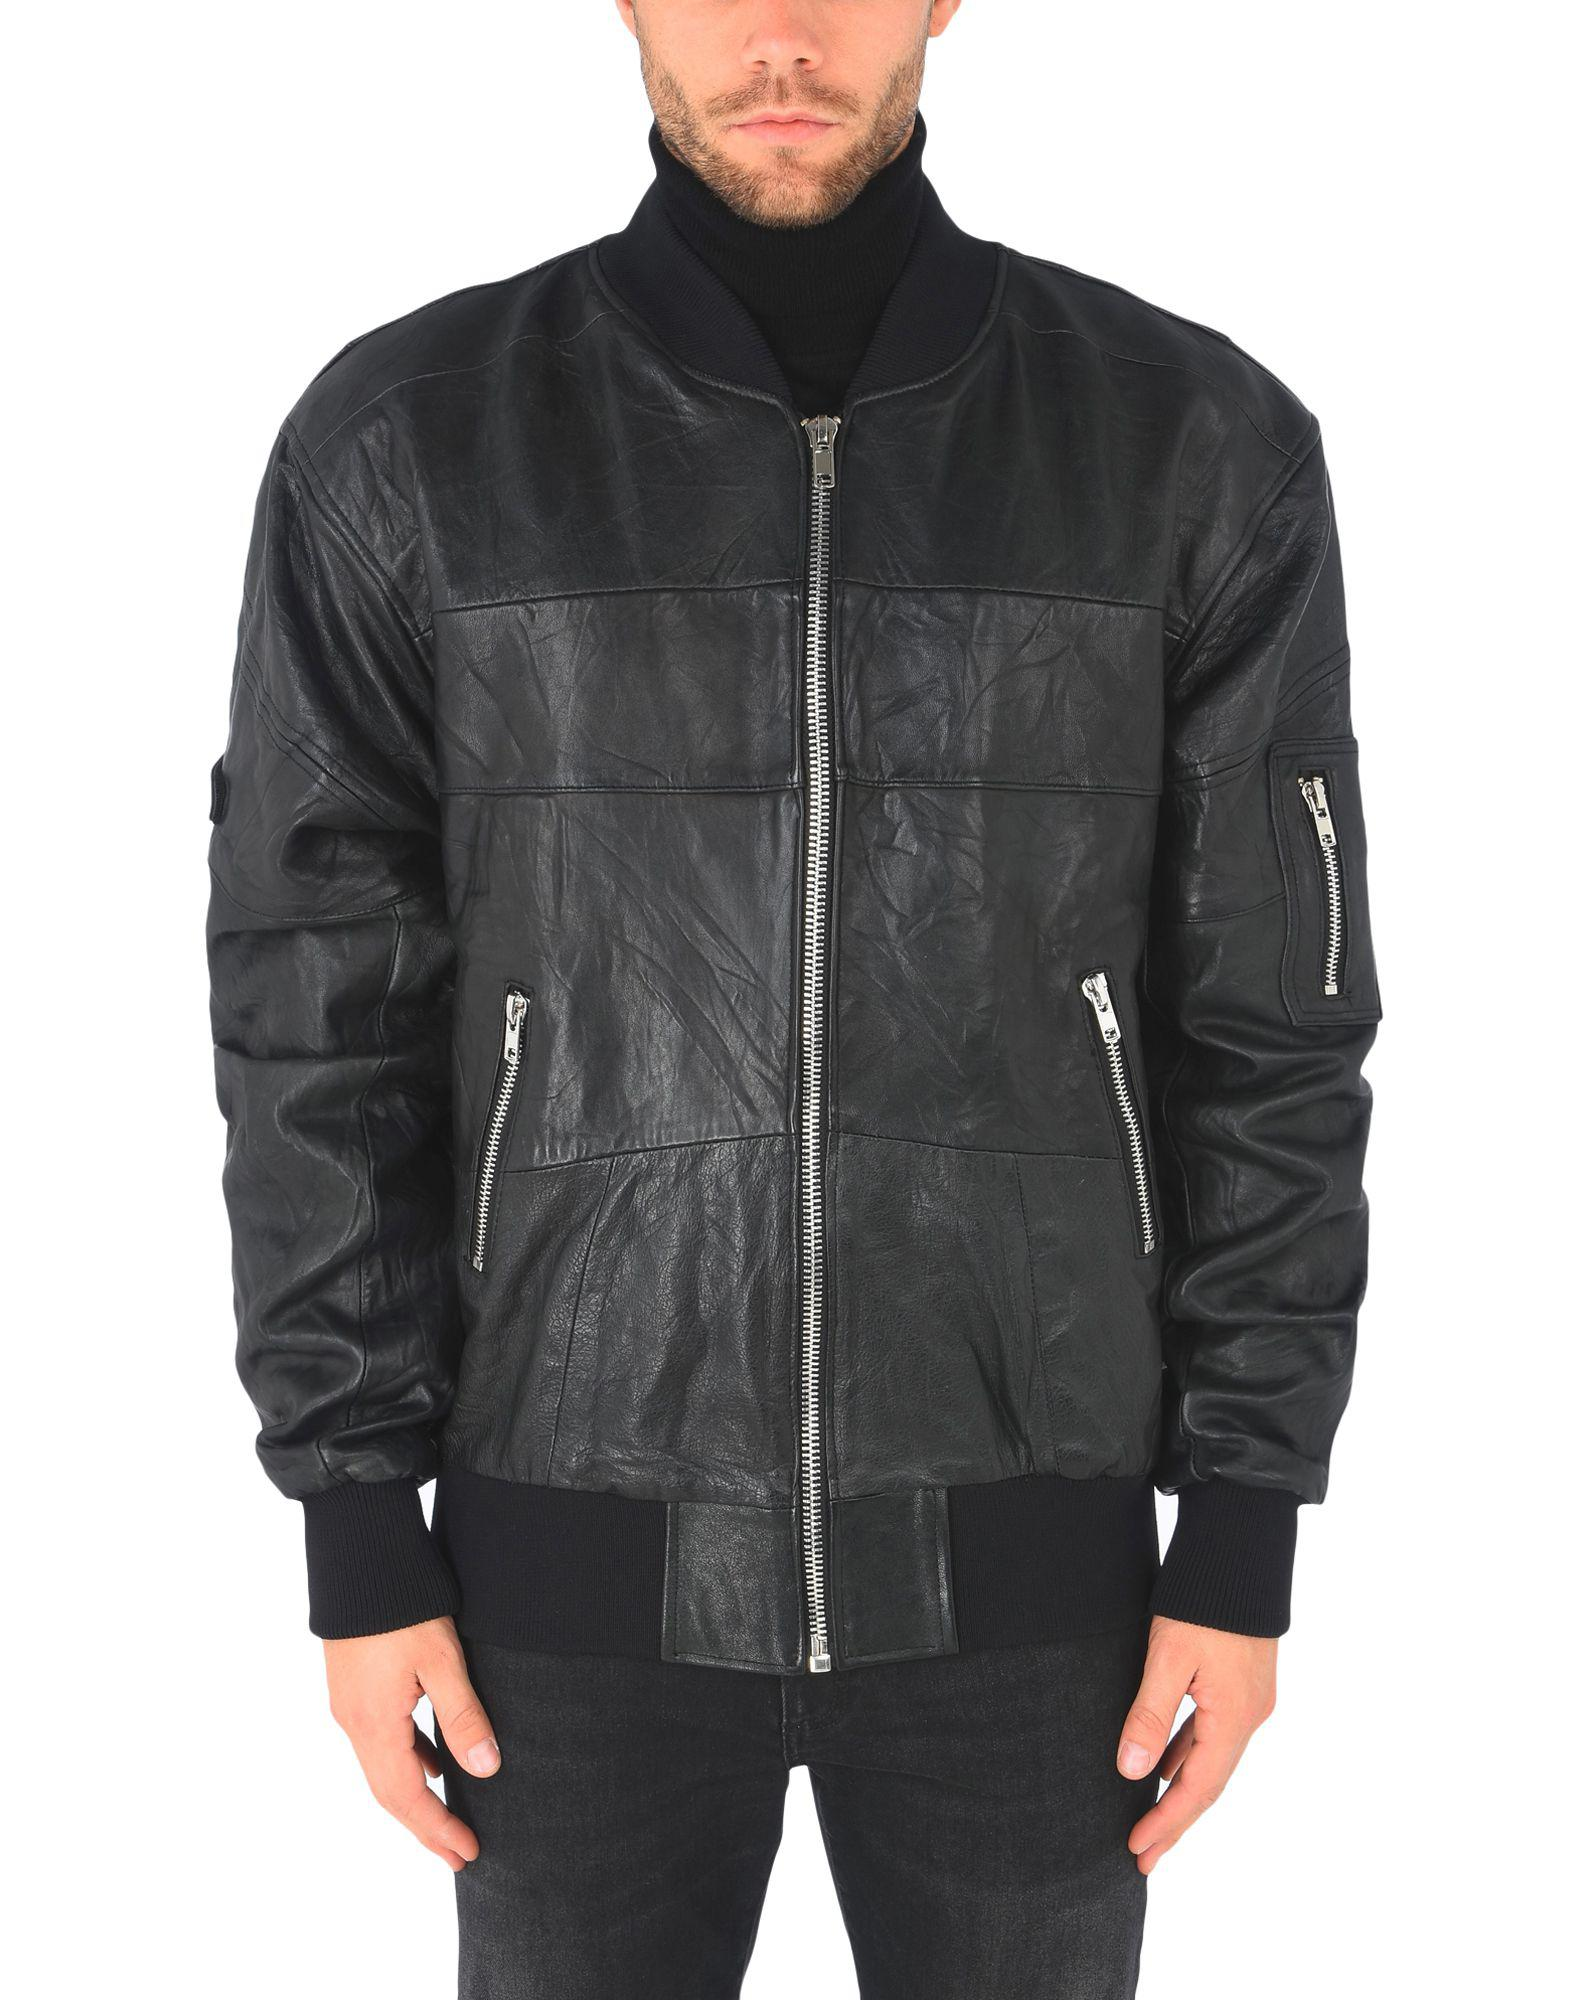 DEADWOOD Leather Jacket in Black for Men